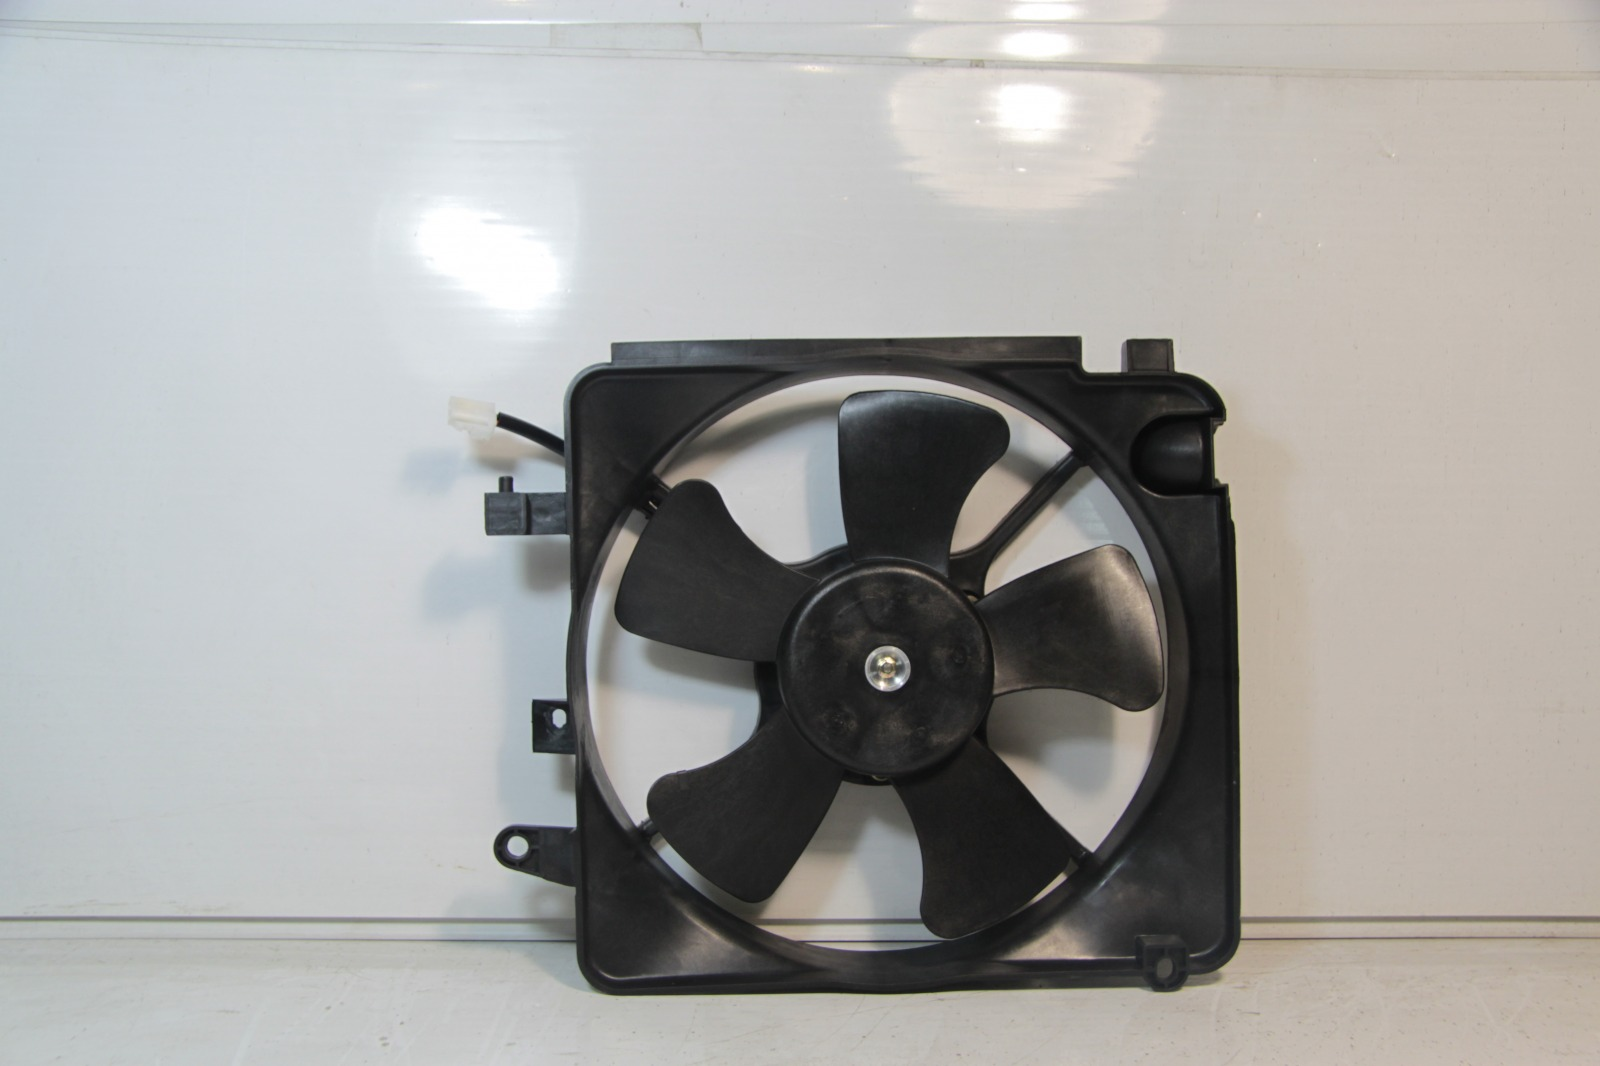 Вентилятор радиатора Daewoo Matiz 0.8 1998